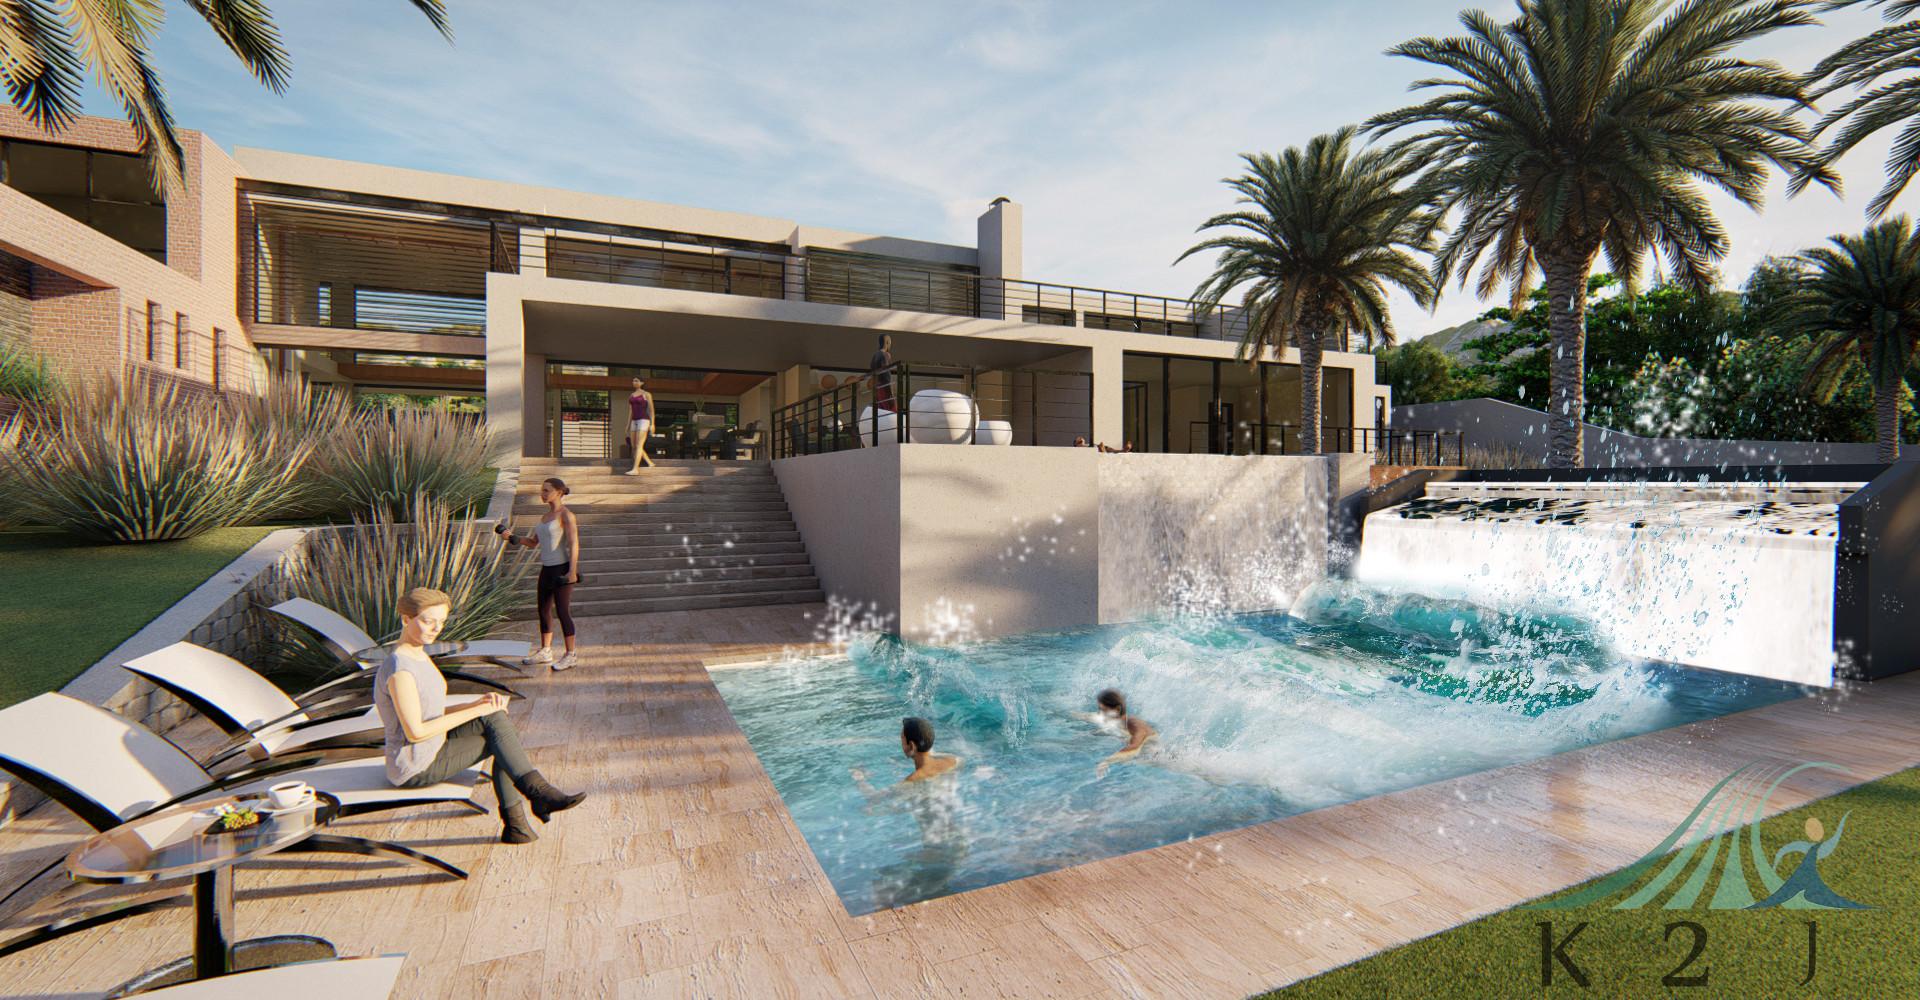 Wave pool ในโรงแรม